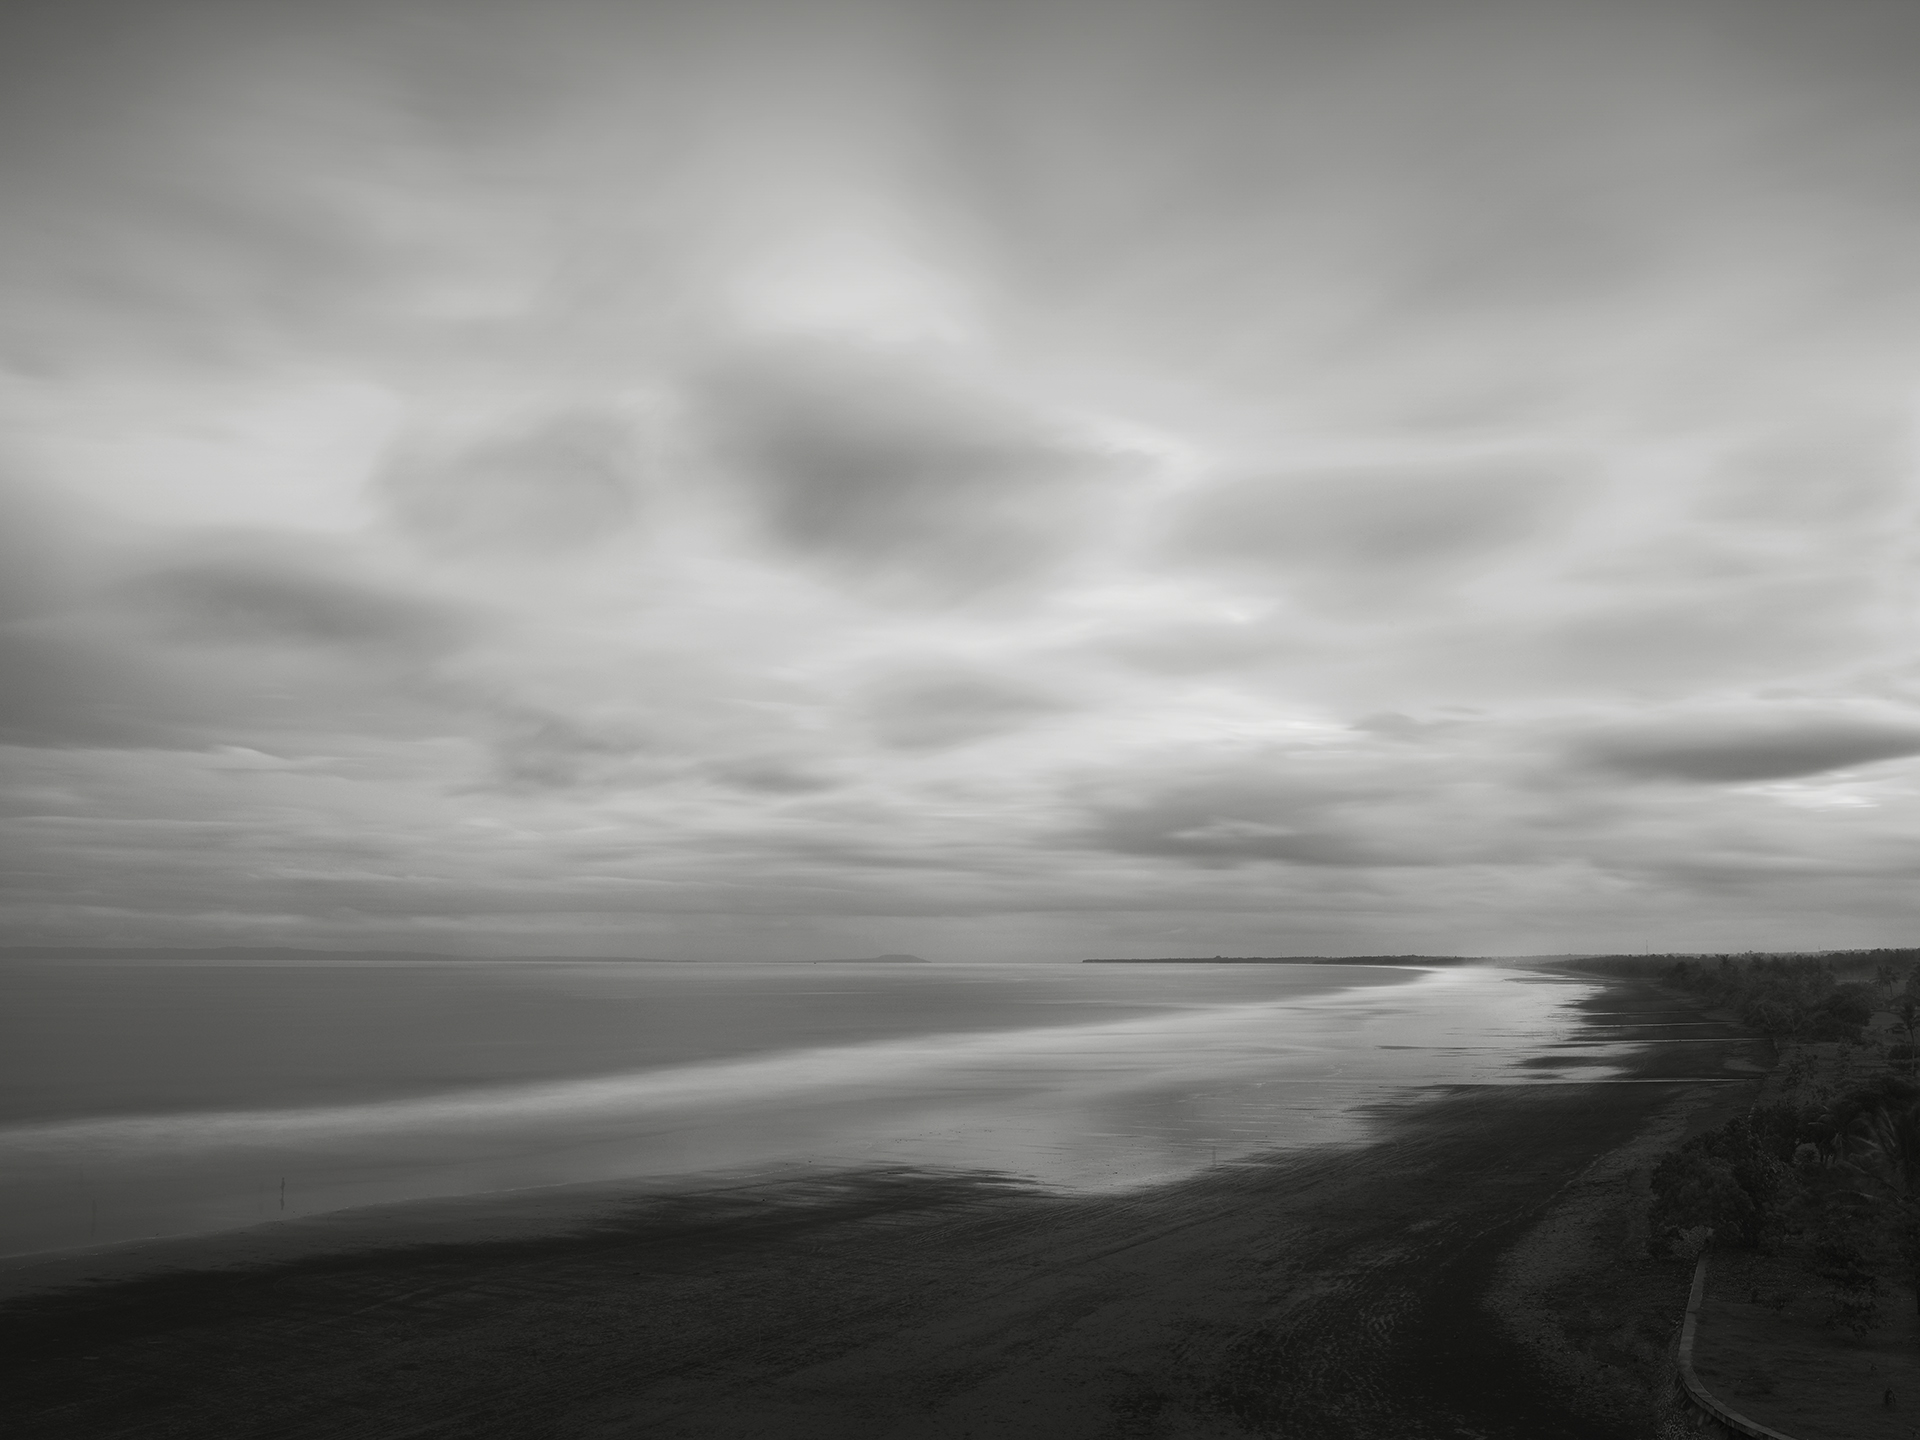 Western Black Sands, Bali - 2010 copy.jpg